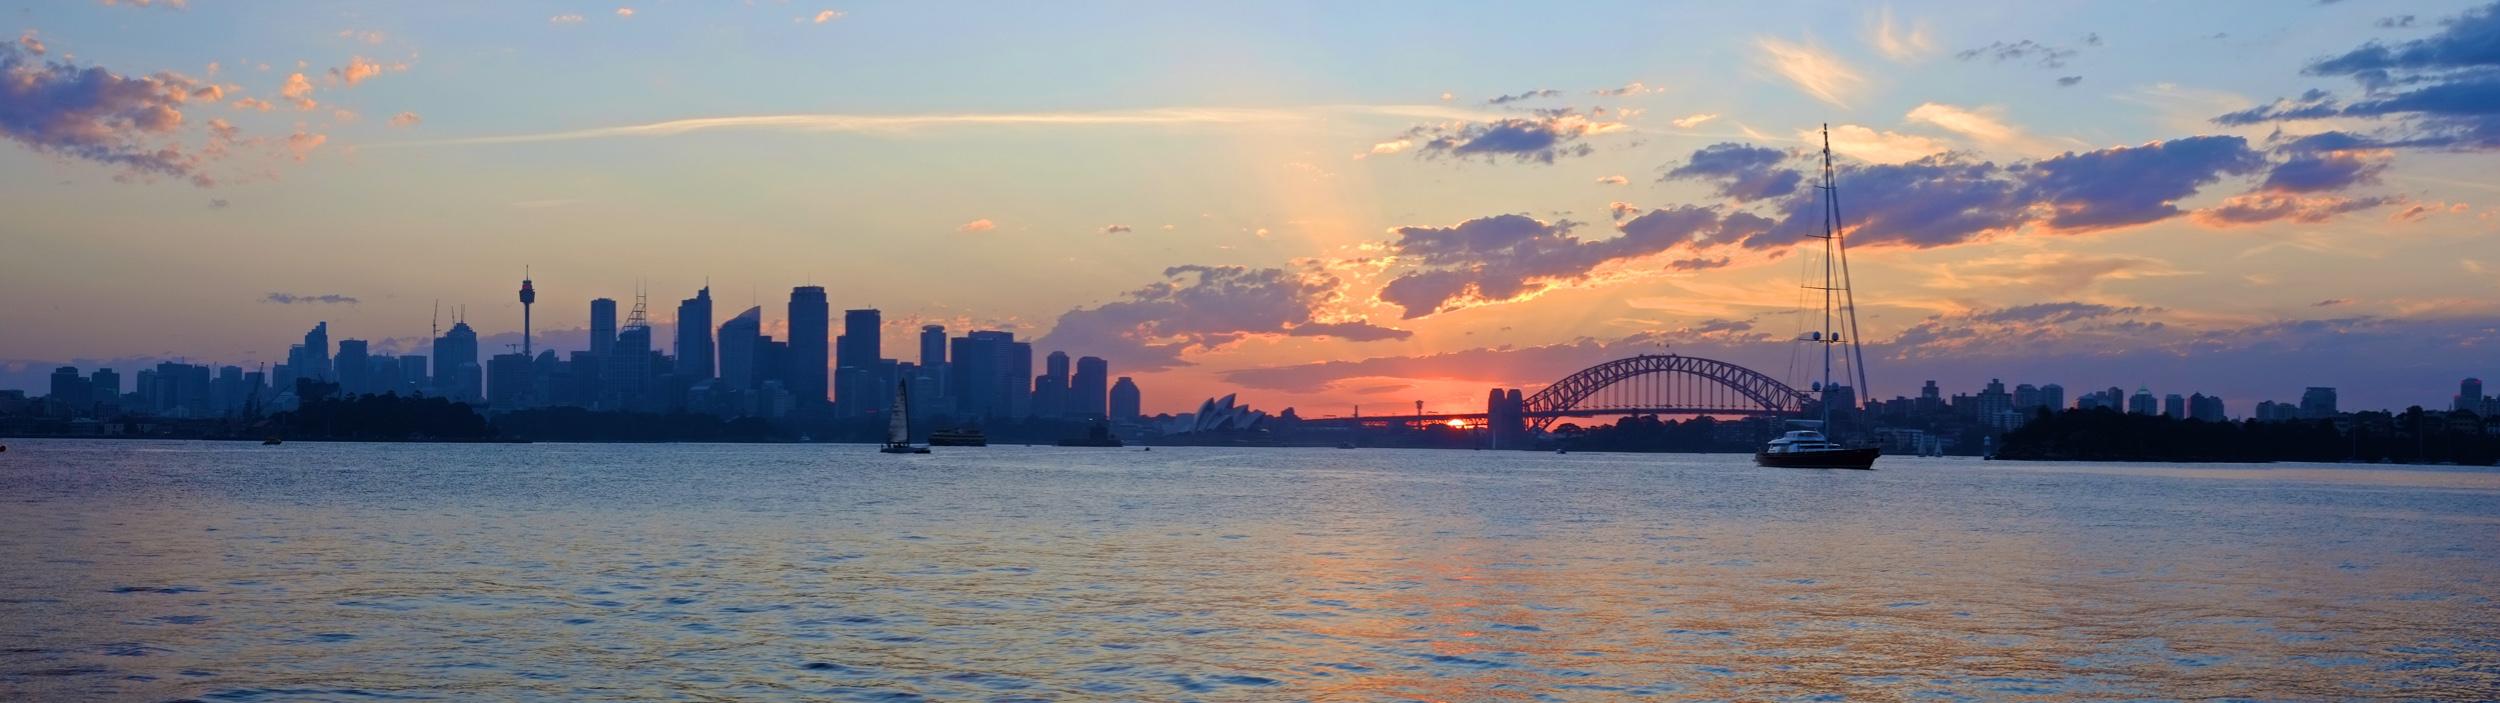 Fuji X-E1 Sydney Panoramic